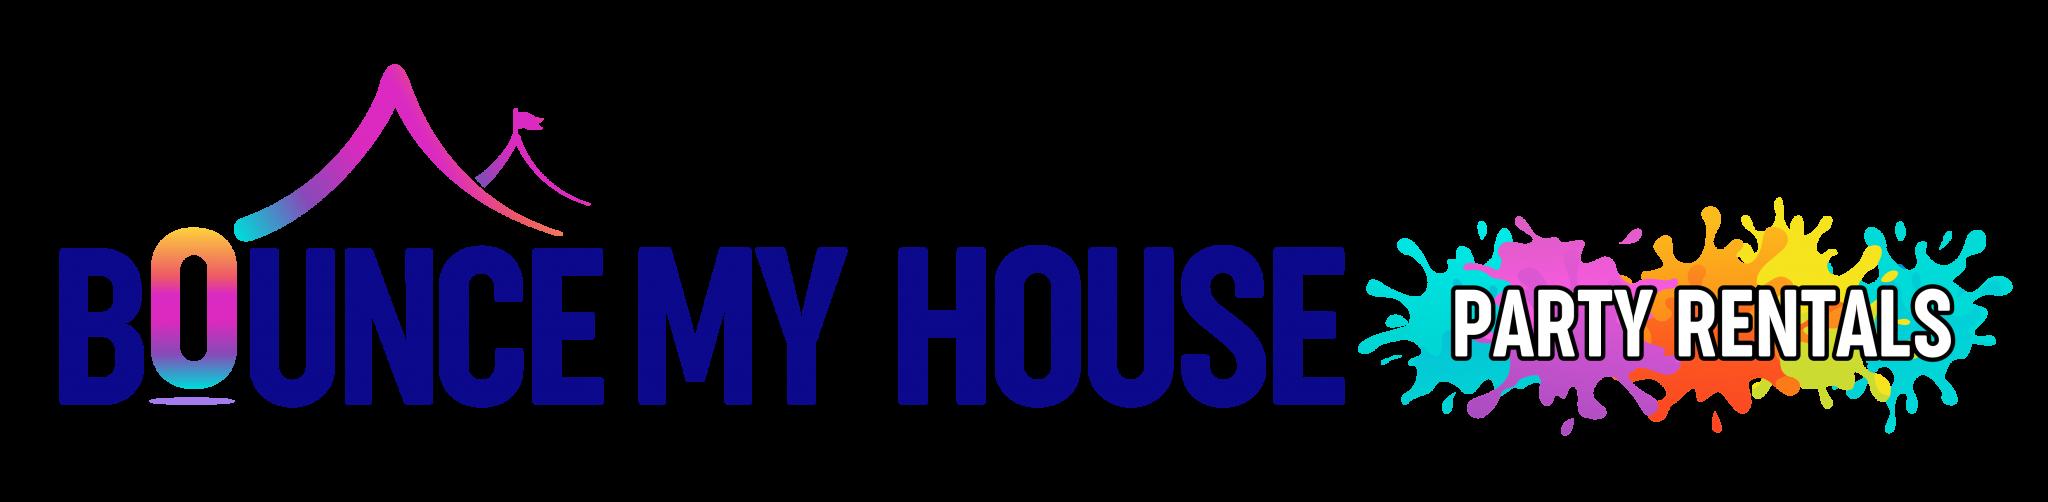 Bounce House & Party Rentals | BounceMyHouse.com Oak Lawn IL.